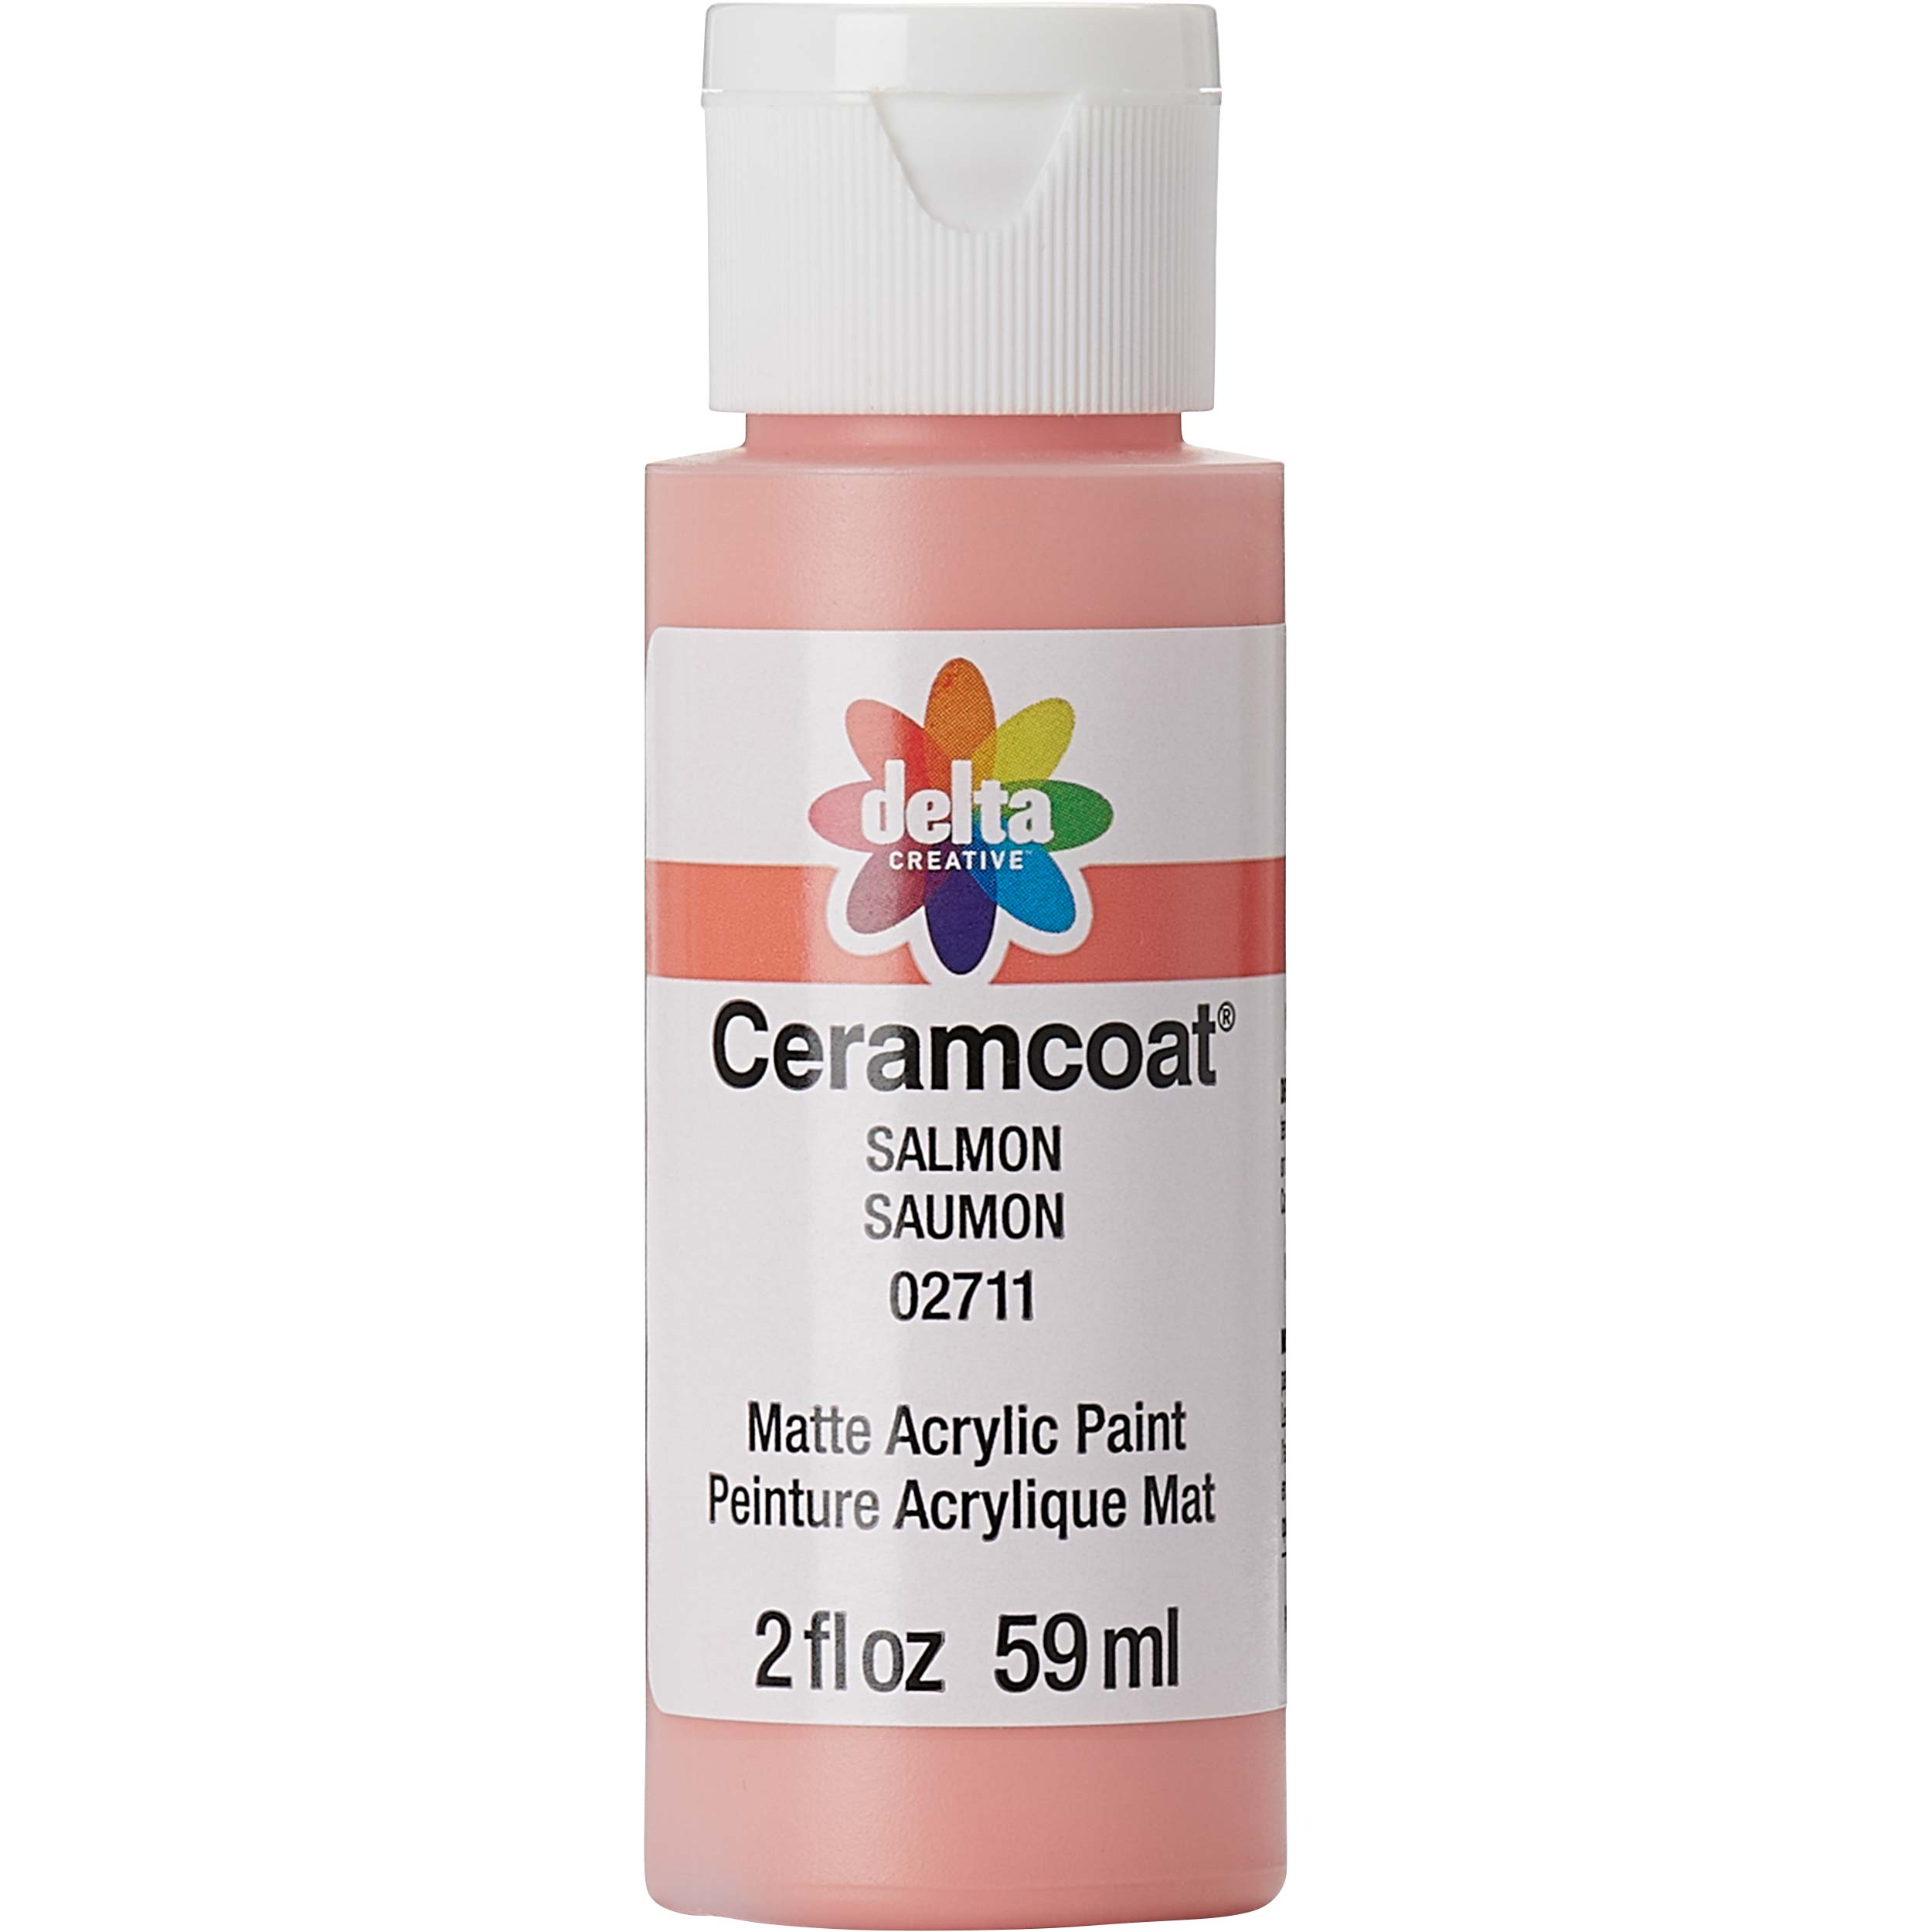 Delta Ceramcoat Acrylic Paint - Salmon, 2 oz. - 02711